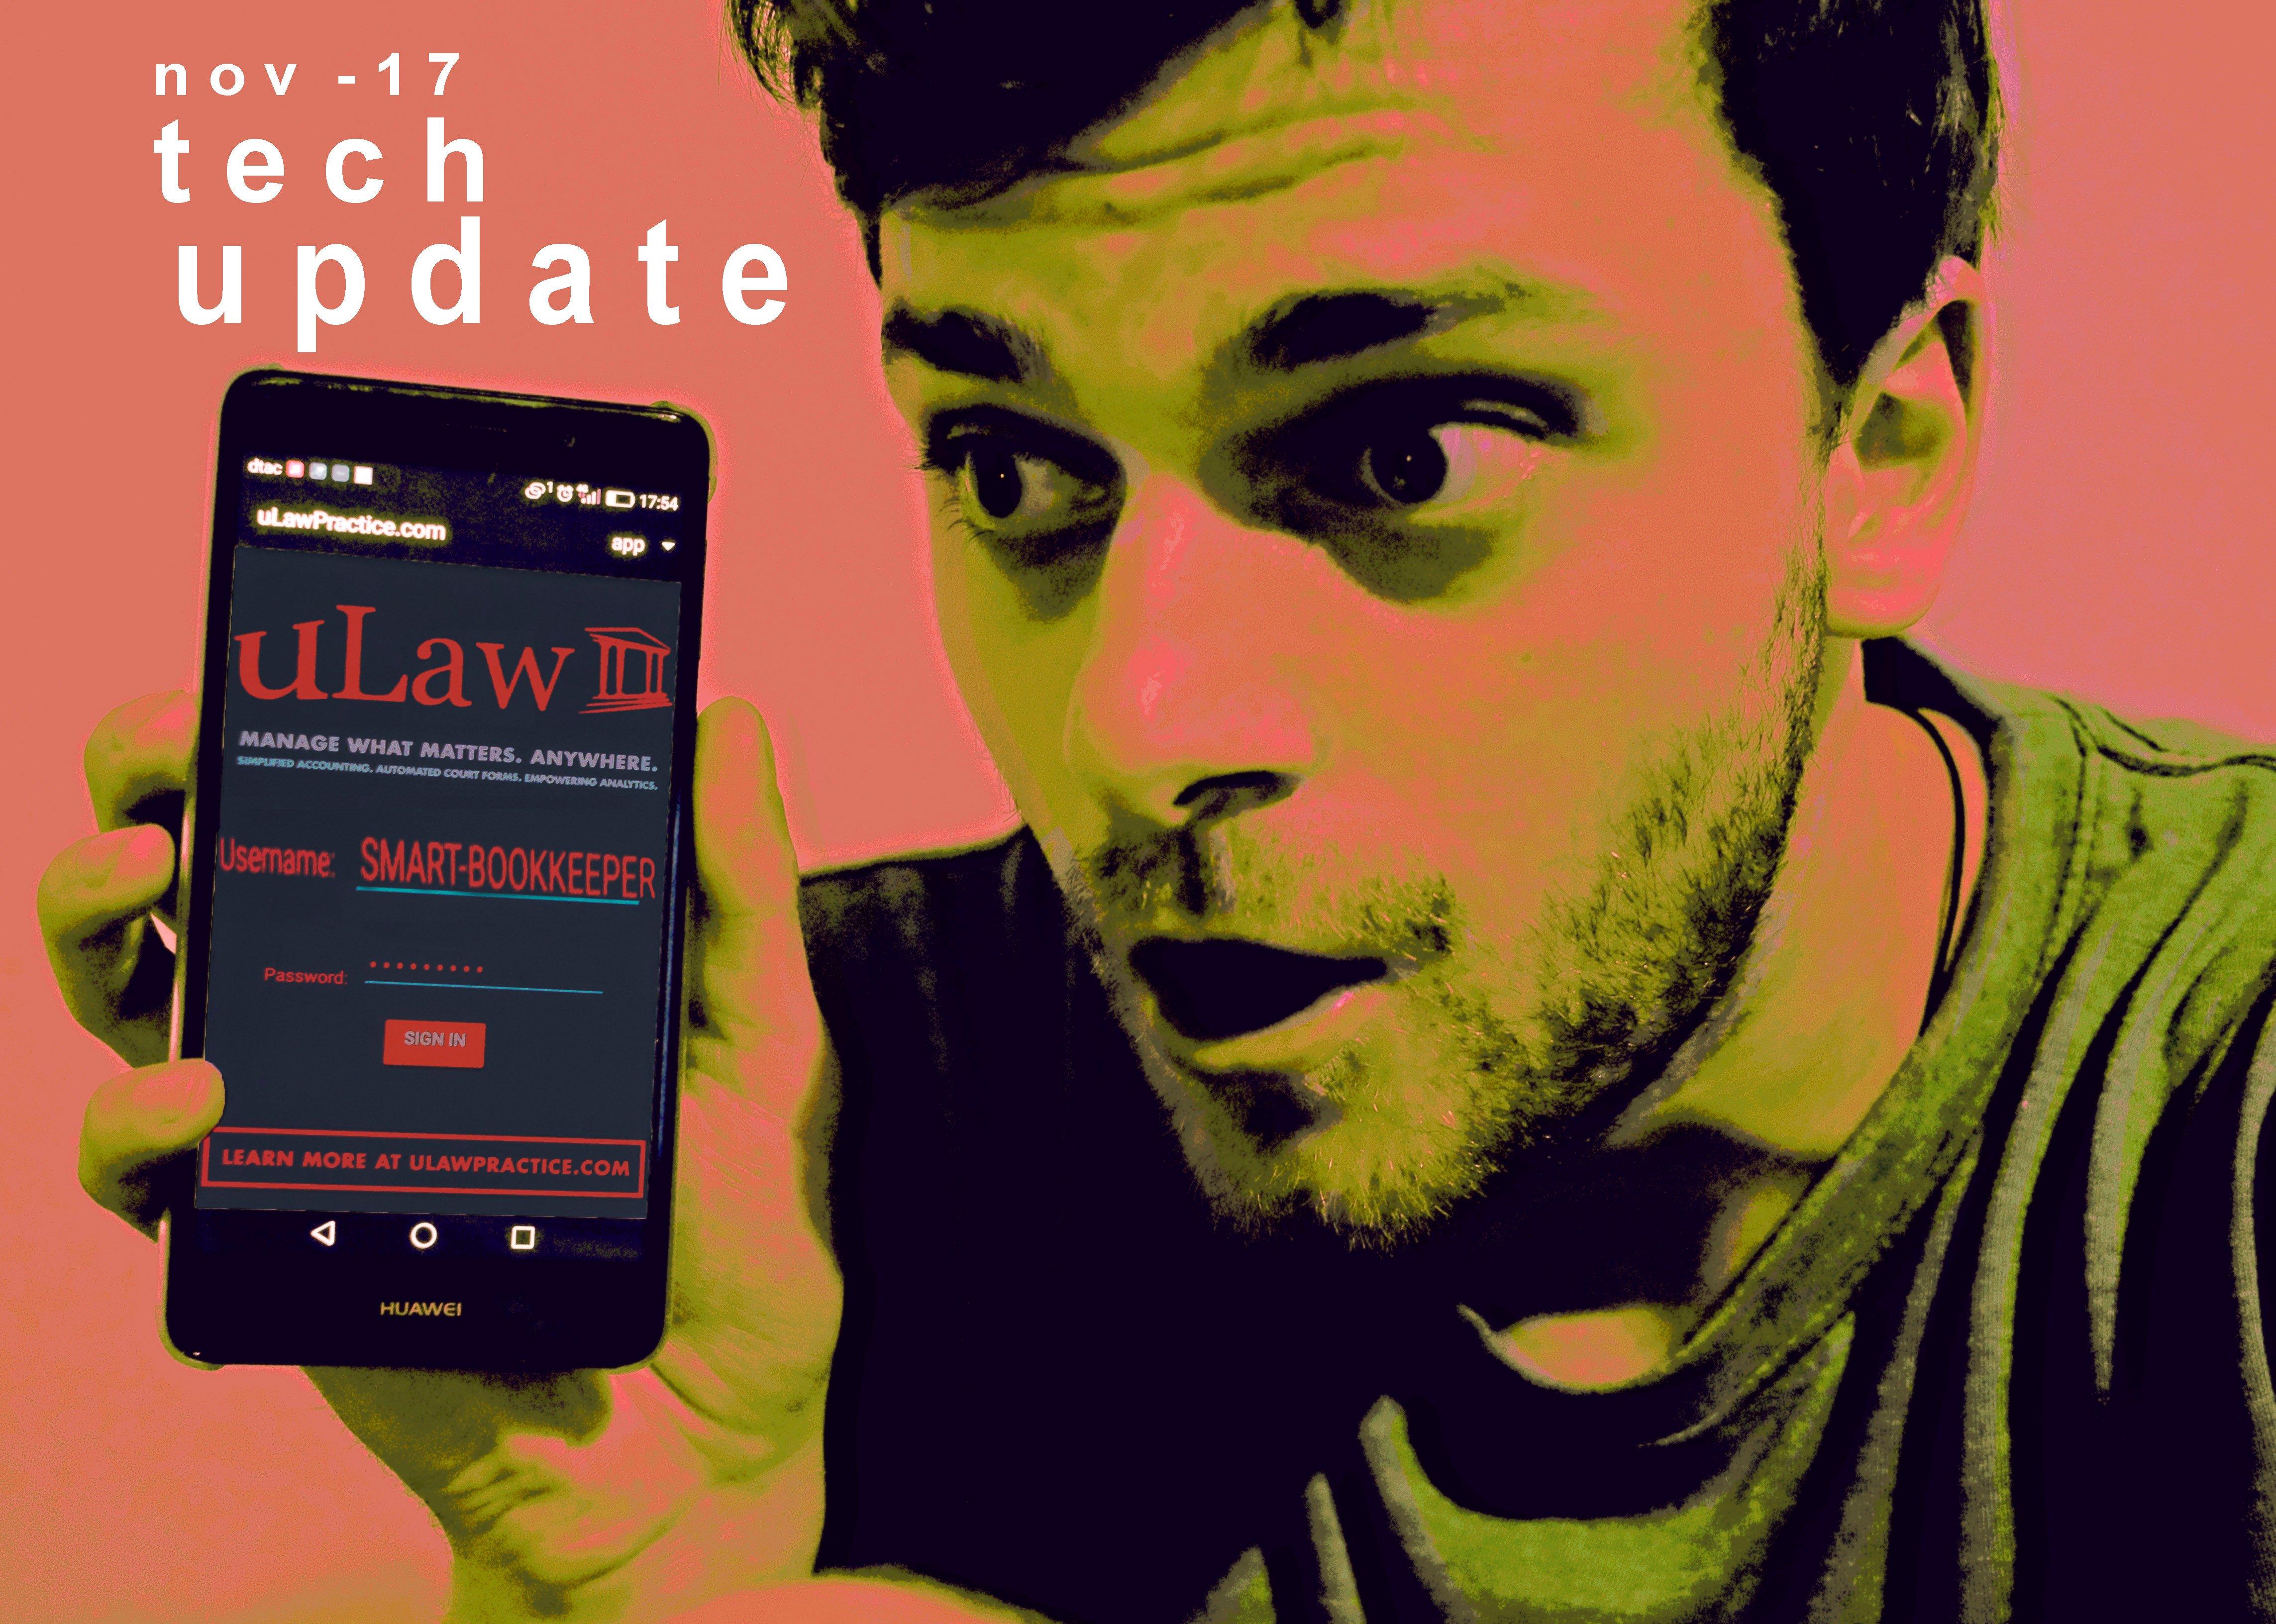 tech-update-nov-17-import-phone-call-logs